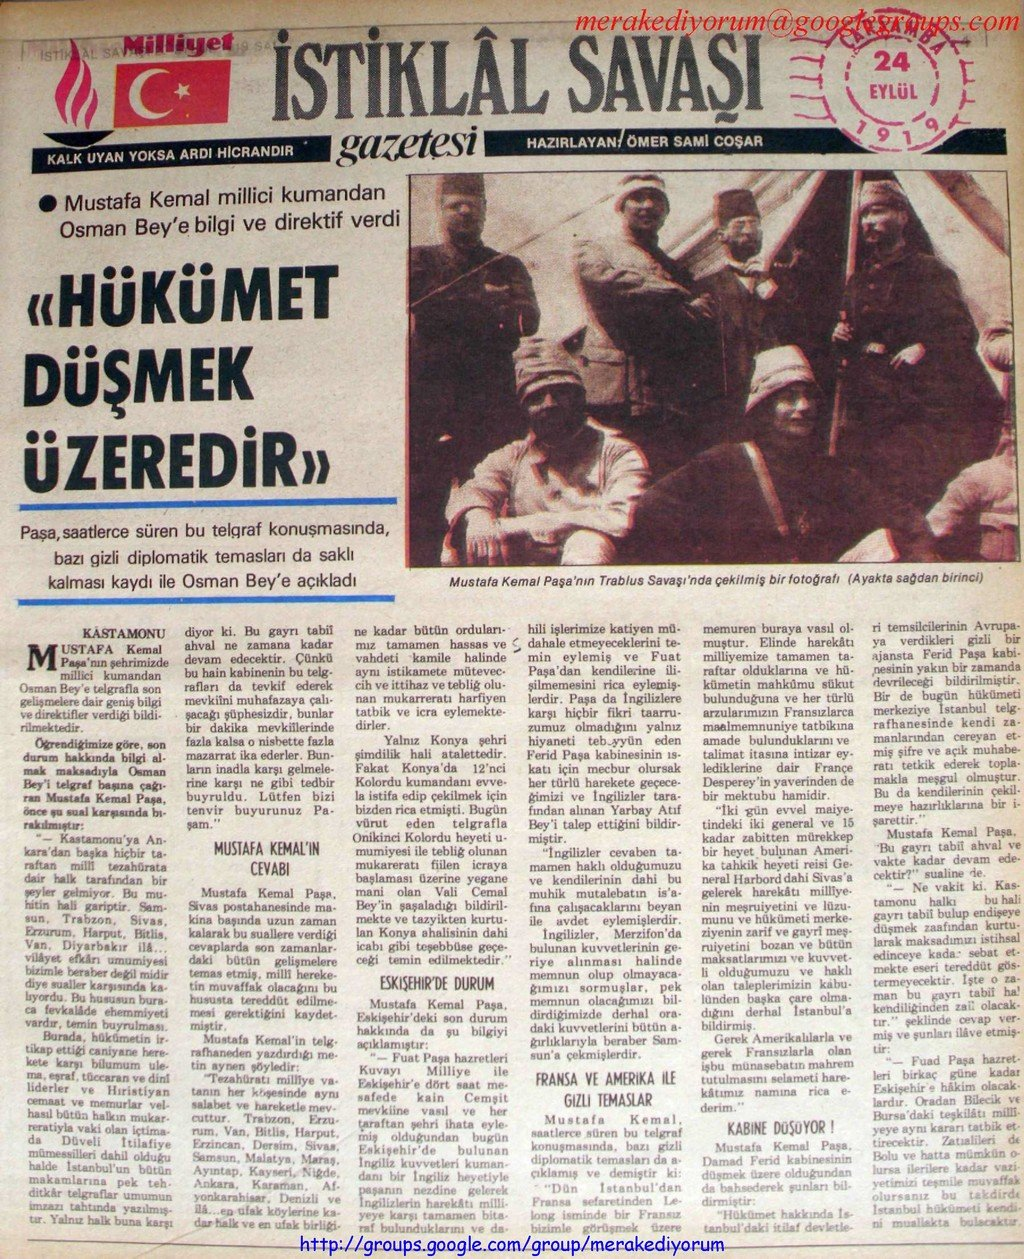 istiklal savaşı gazetesi - 24 eylül 1919